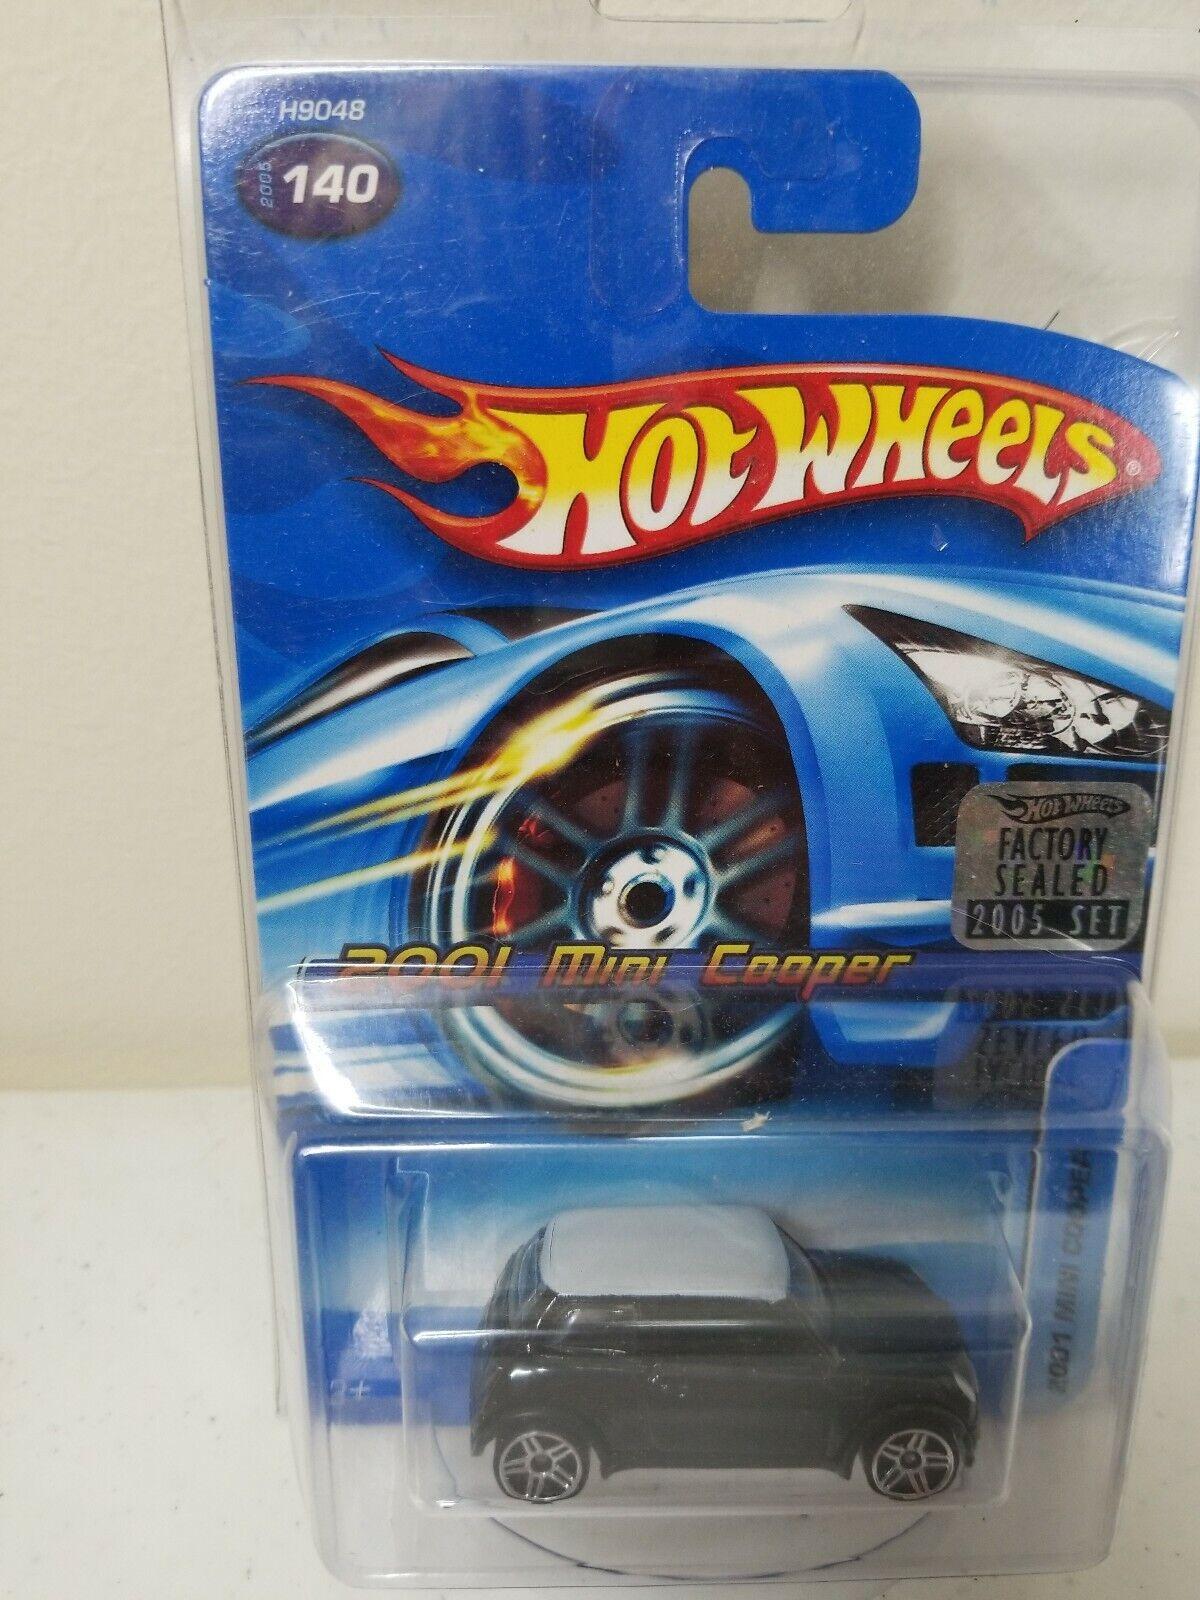 Hot Wheels, 2001 Mini Cooper 140, Factory Sealed 2005 Set